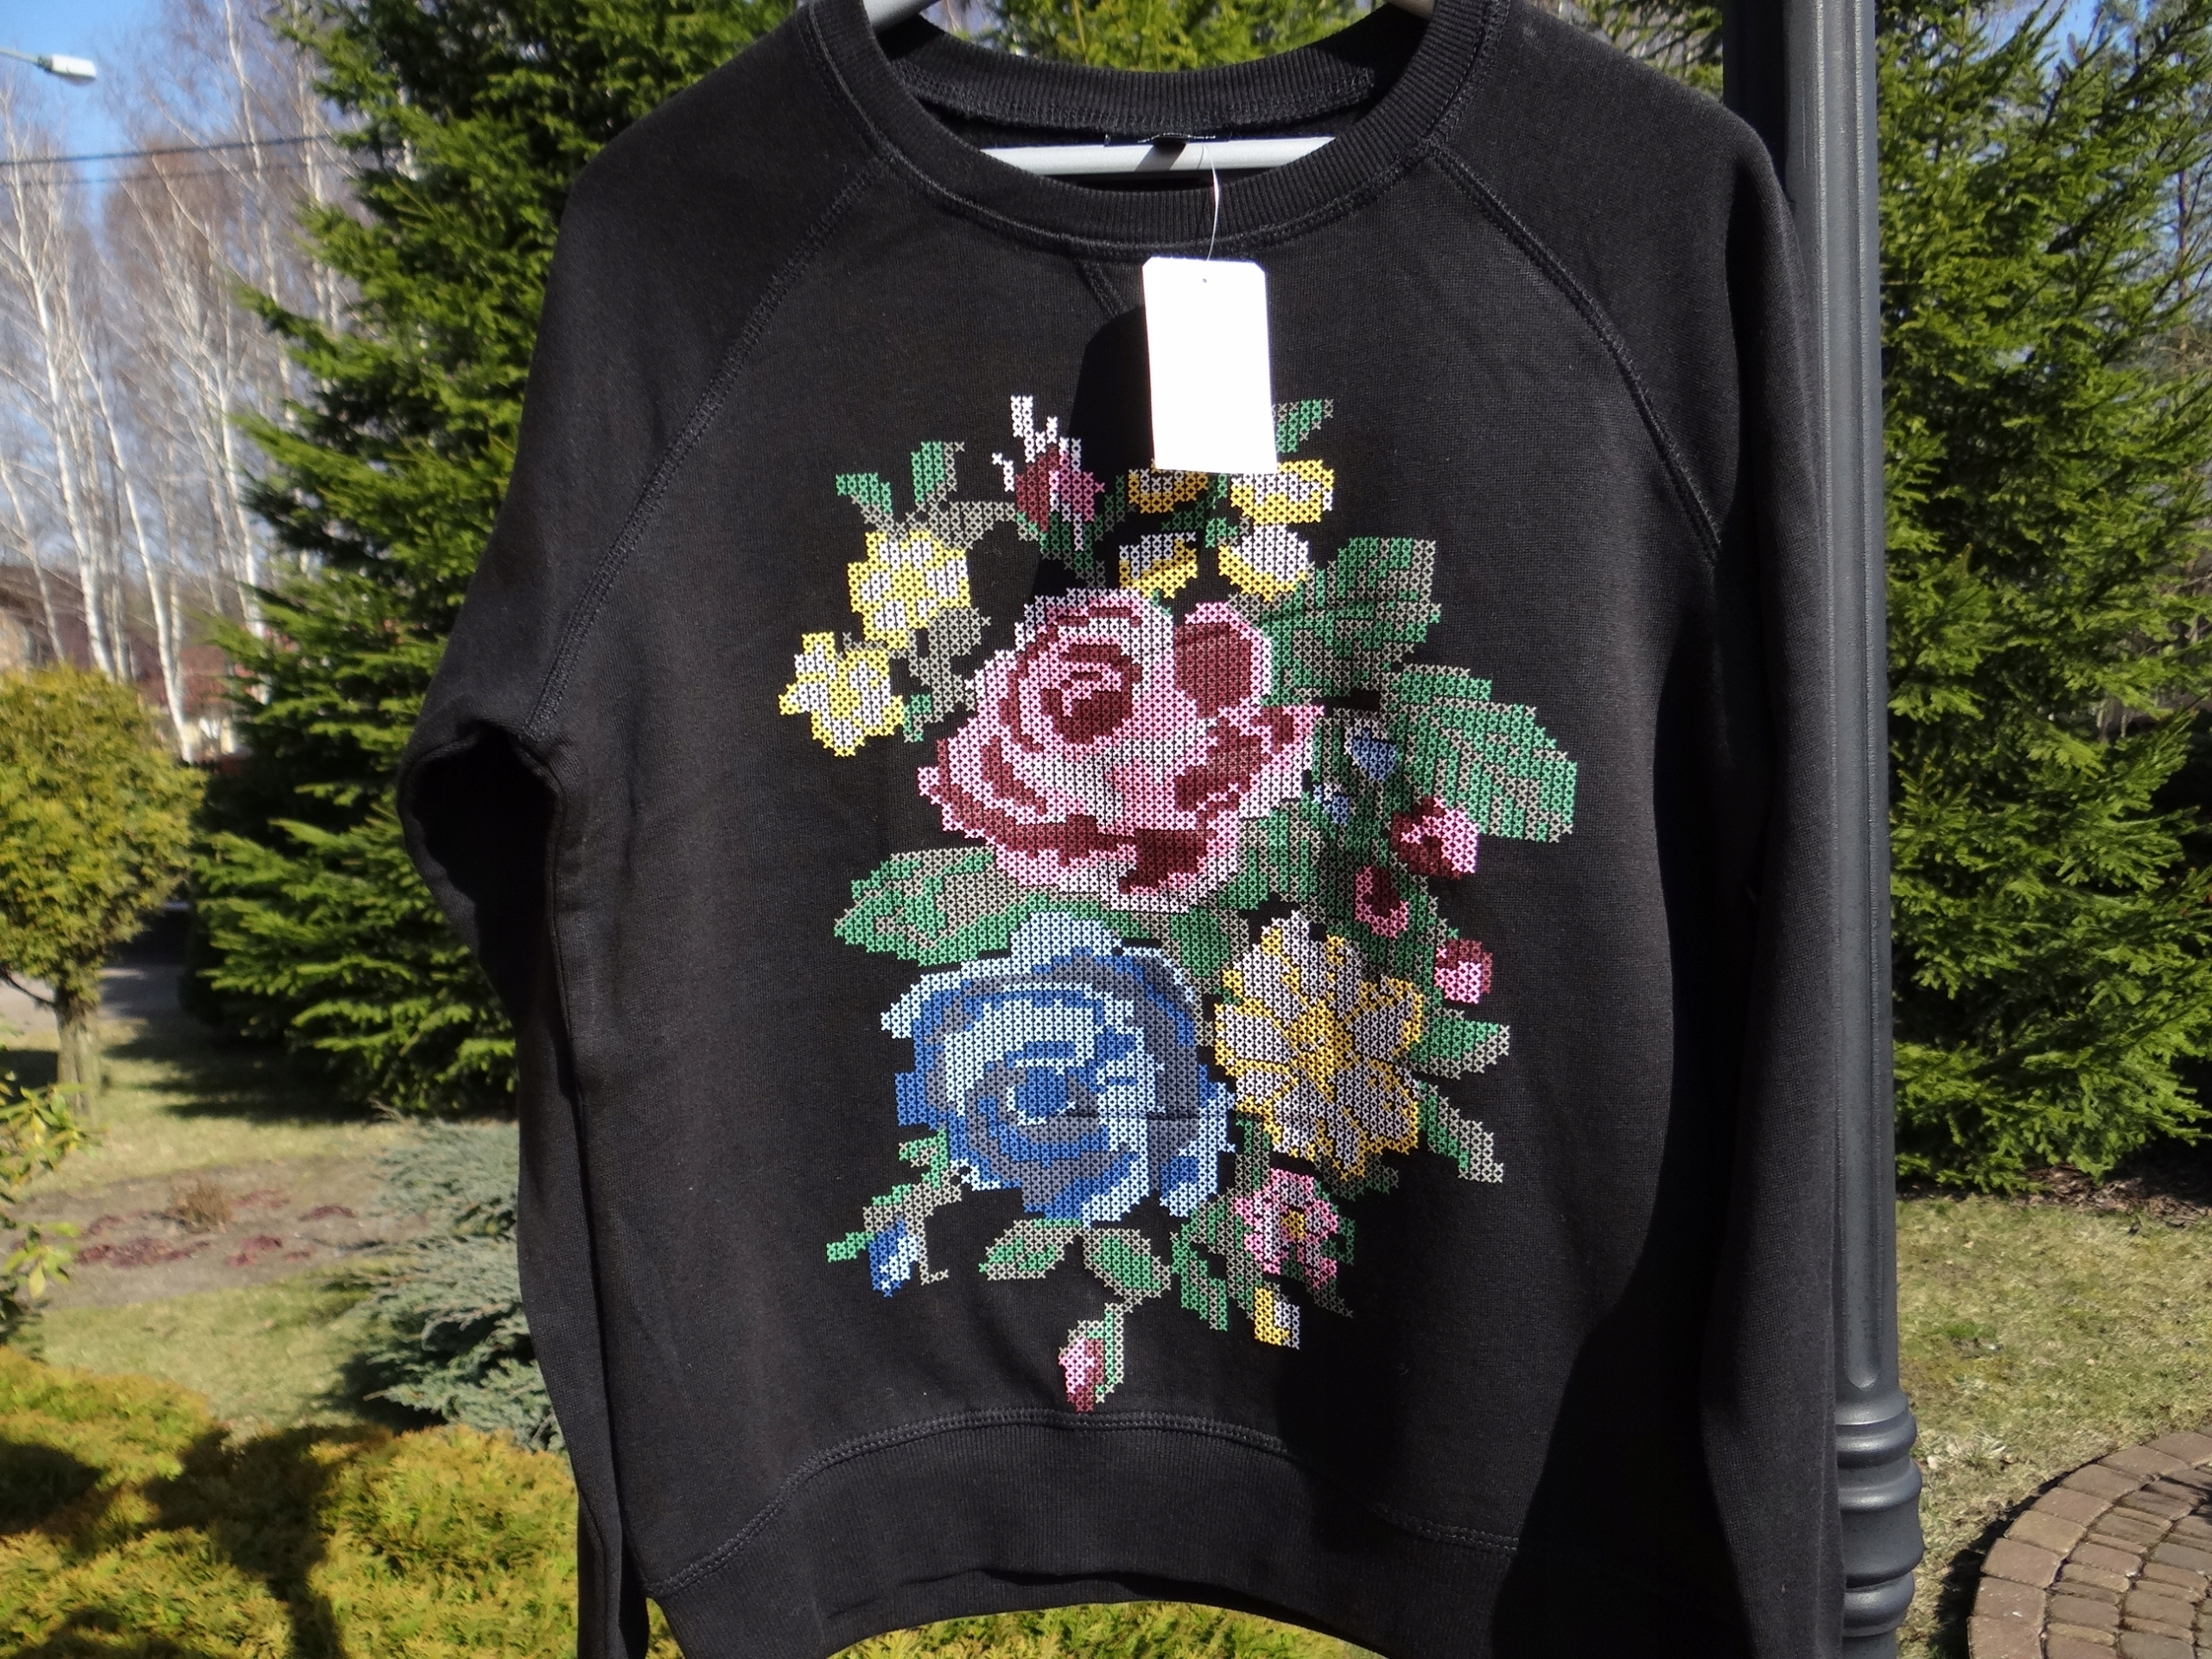 Bluzka Bluza KappAhl r 128 cm